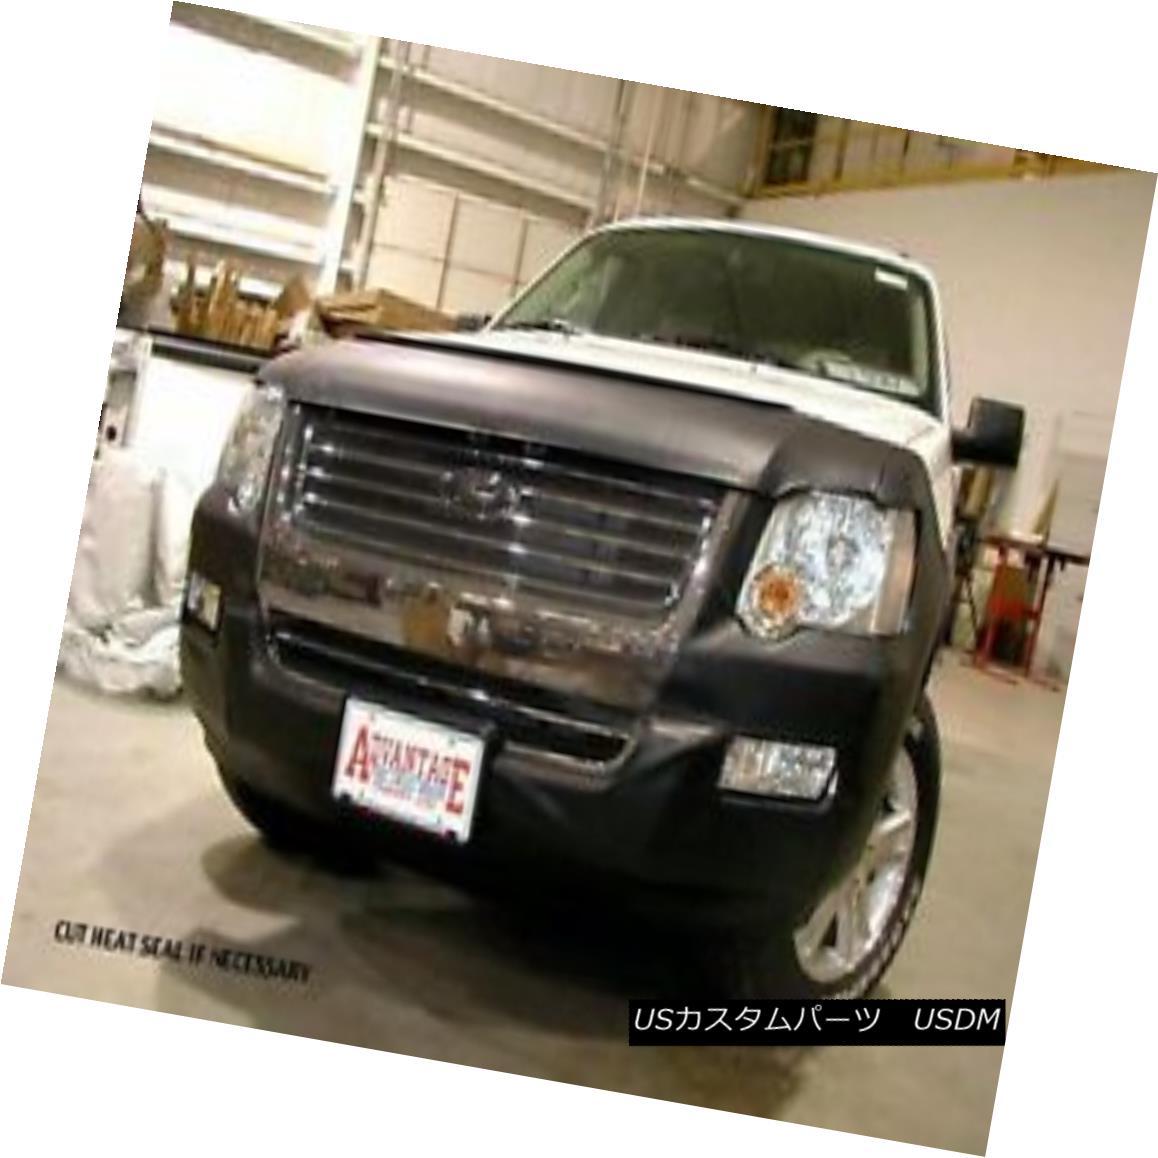 LeBra BRAND NEW 2006-2010 Ford Explorer 2007-2010 Sport Trac Mask Bra 551061-01